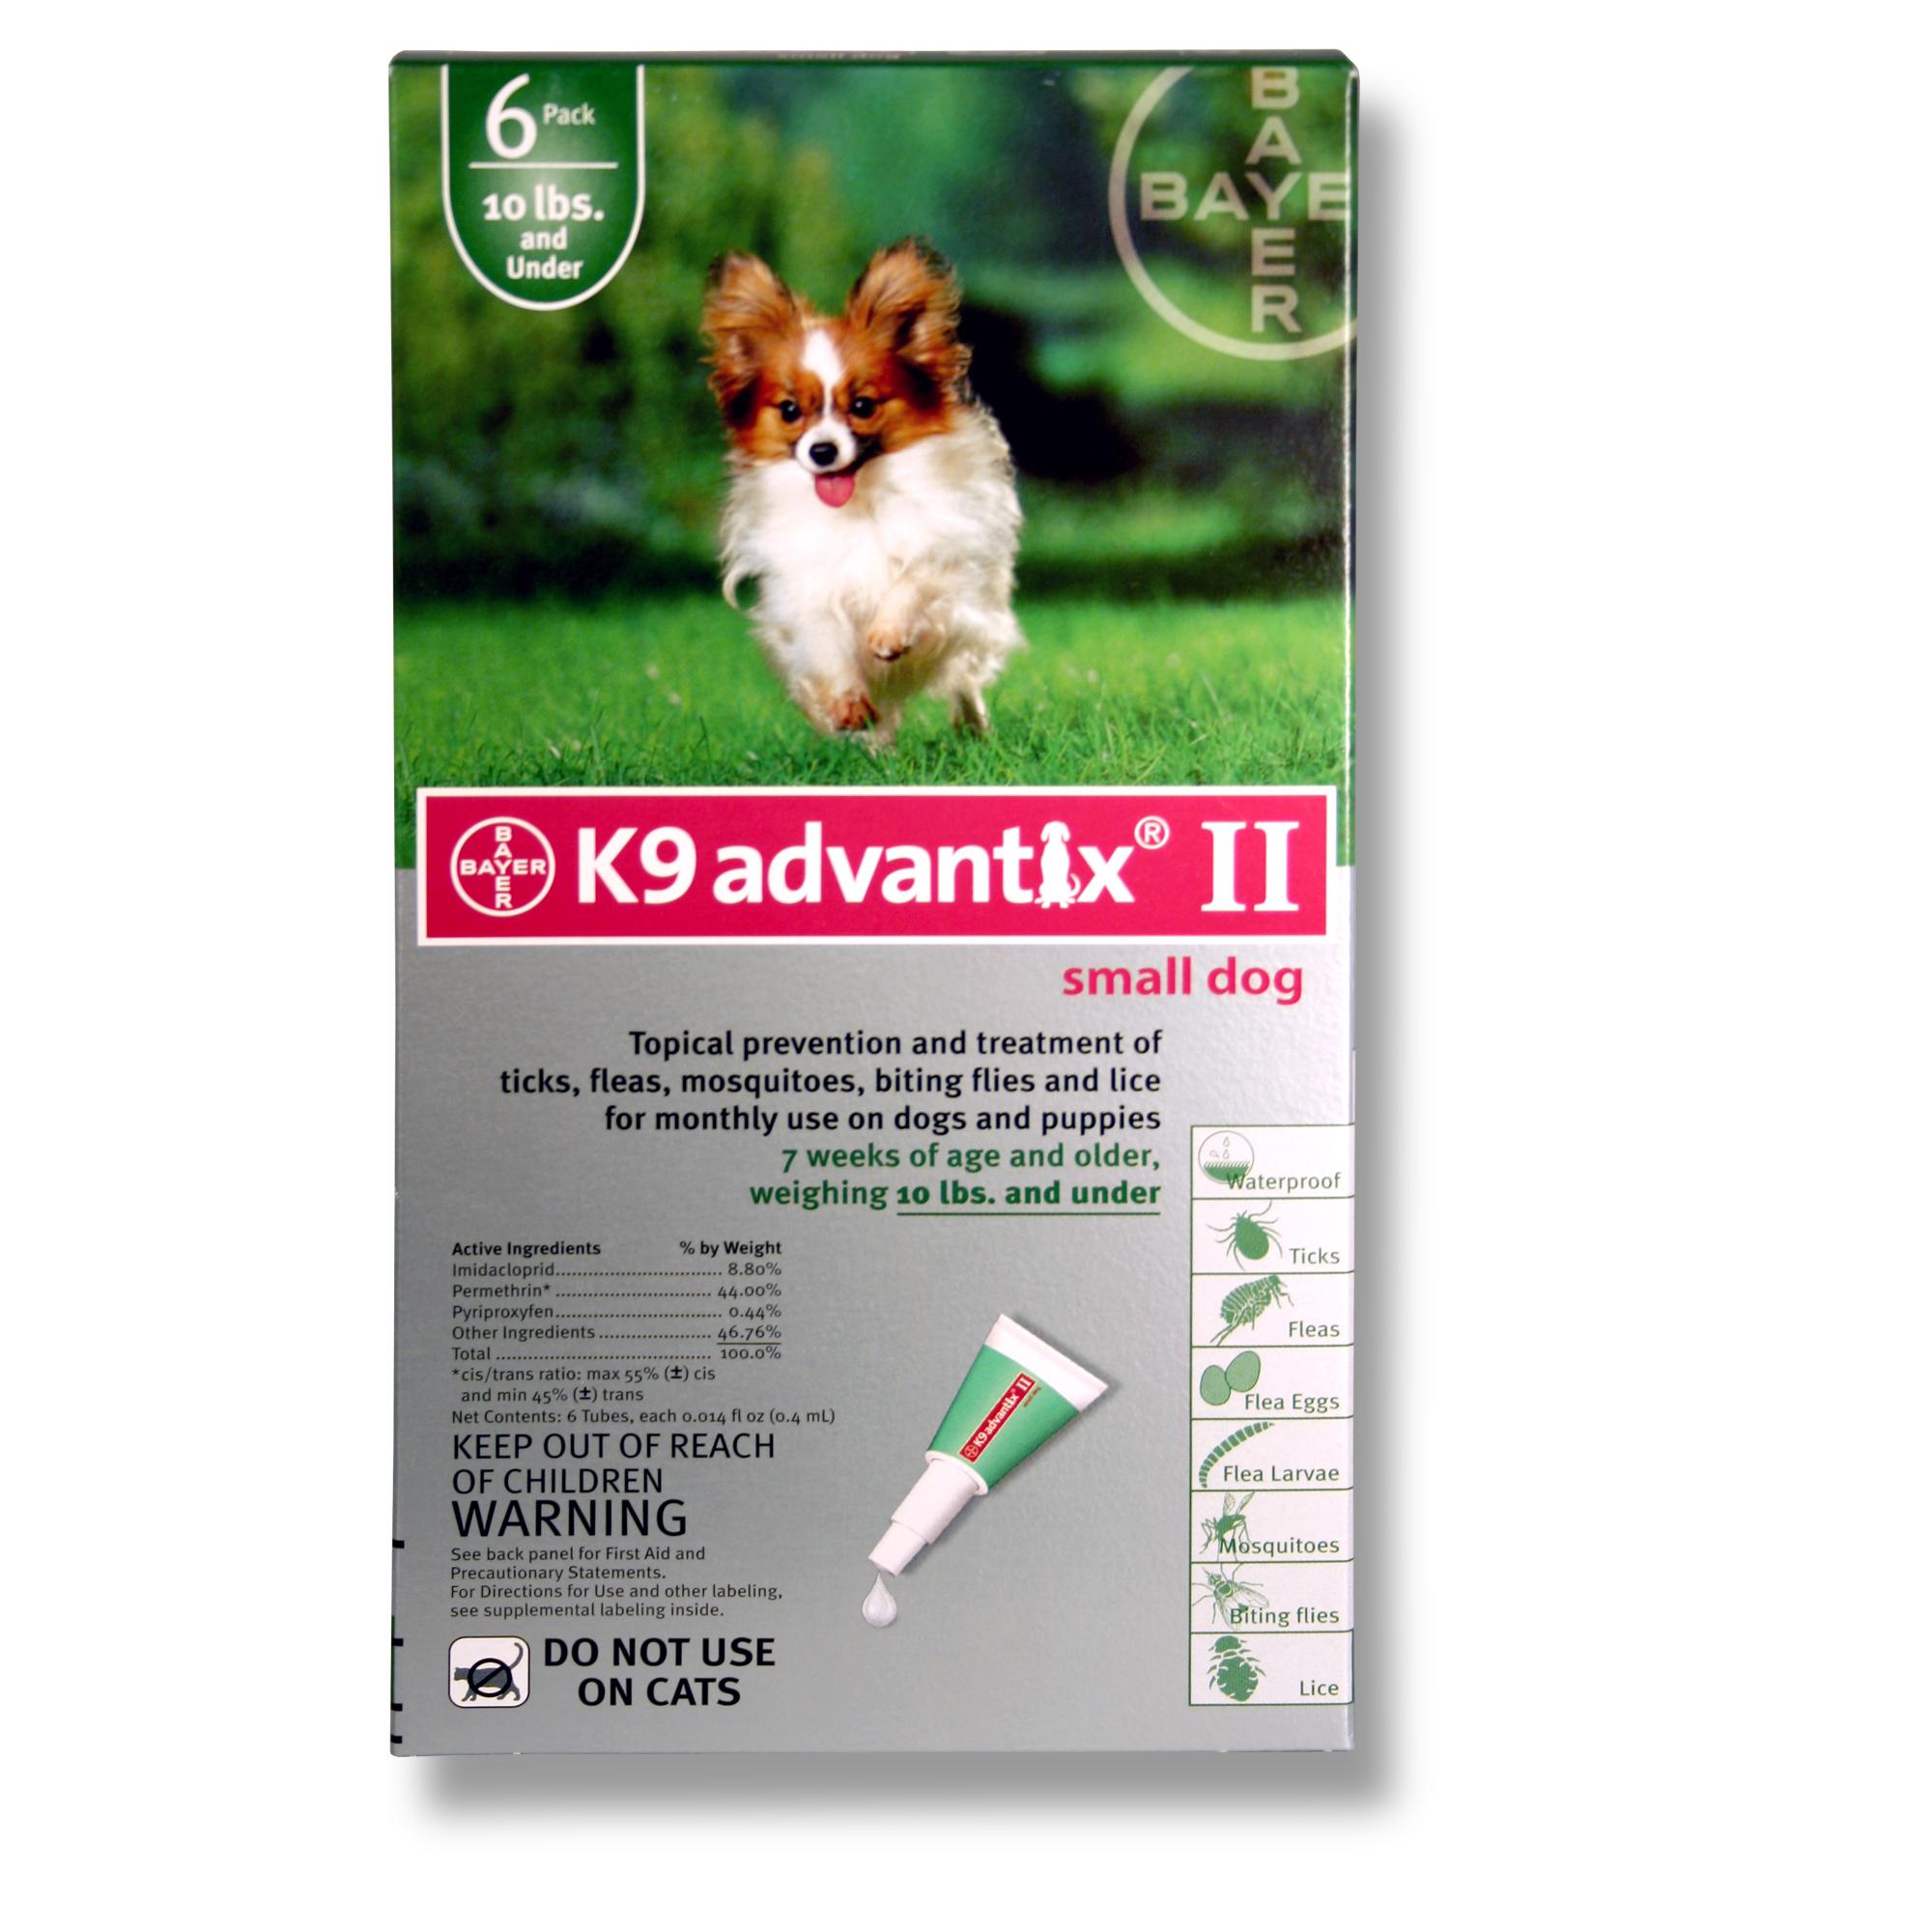 K9 Advantix Ii Small Dog 10 Lbs And Under 6 Pack Green